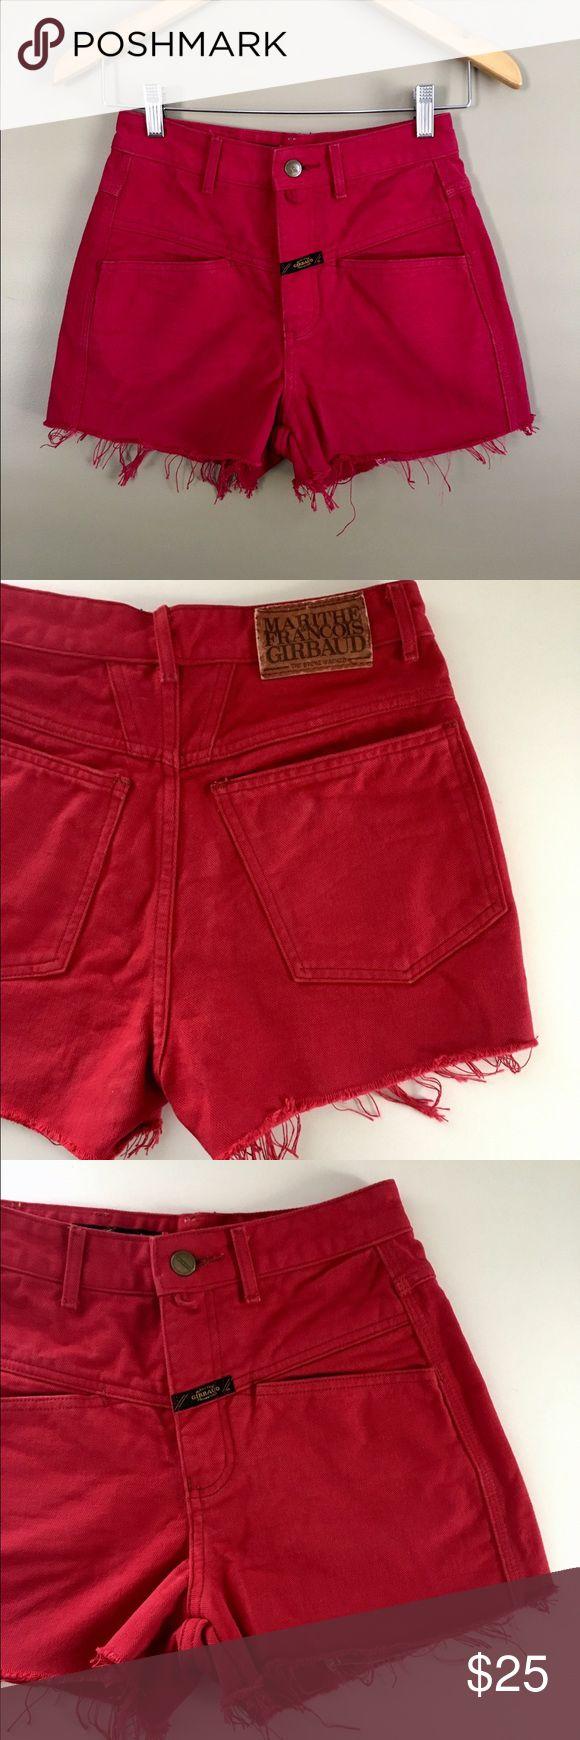 Vintage Girbaud Deep Red Denim High Rise Shorts High rise vintage 80s Marithe Francois Girbaud red jean shorts. Yolked waistline adds western flair. Perfect pair of shorts. Size 1/2. Girbaud Shorts Jean Shorts